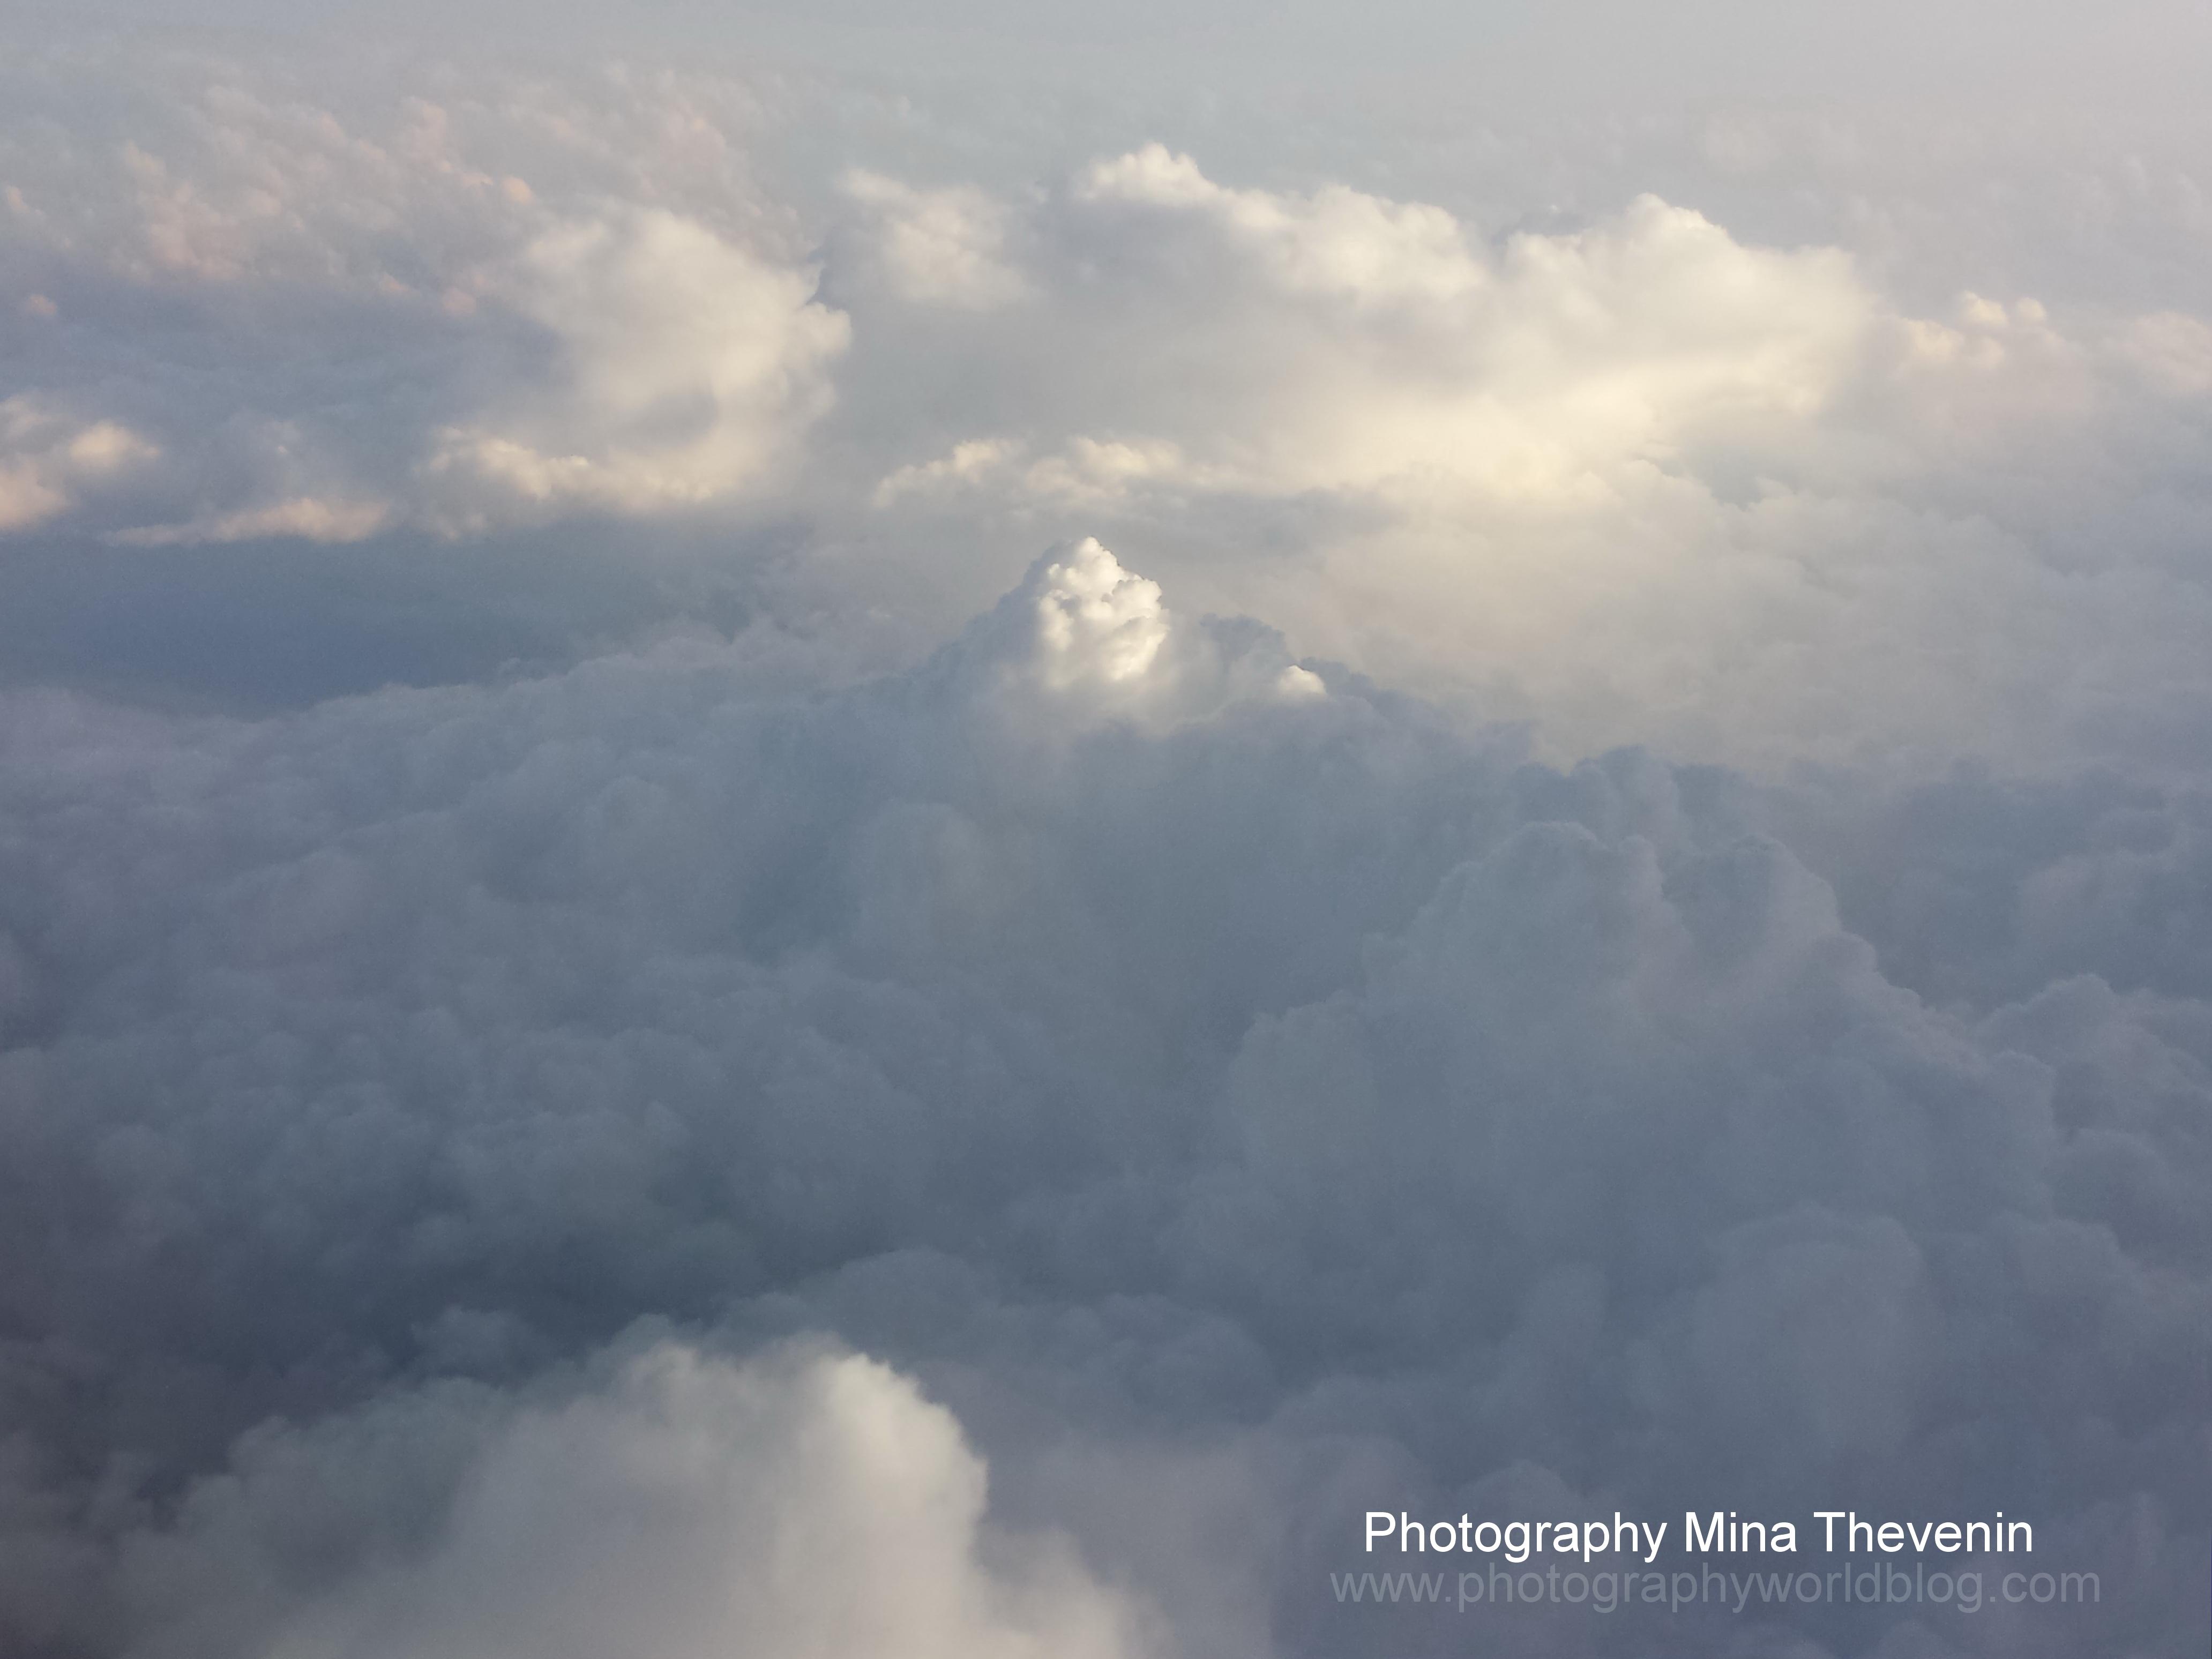 © Sunrise over Mount Cumulus. Photograph by Mina Thevenin. Photography World. www.photographyworld.org